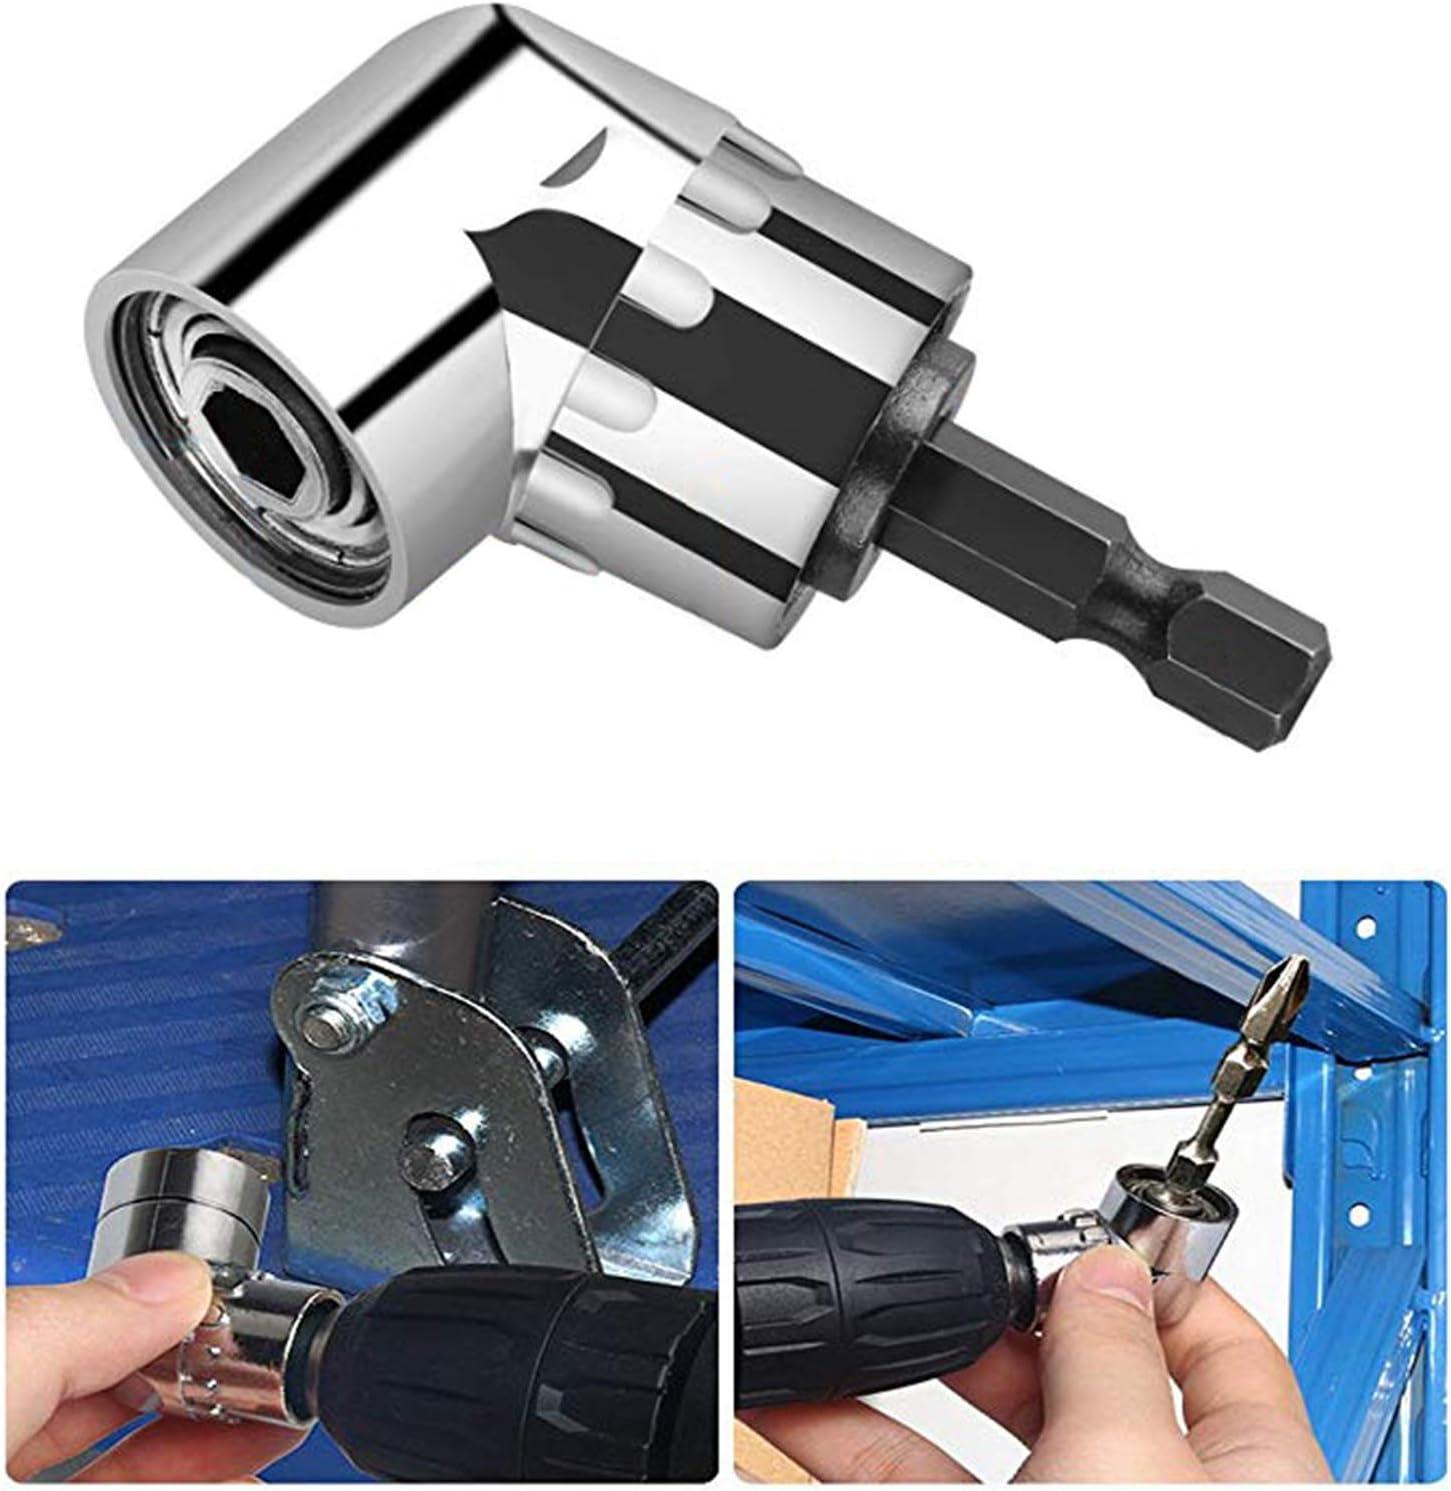 BELIOF Juego de 3 puntas de destornillador de v/ástago hexagonal Portabrocas magn/ético de 60 mm 100 mm 150 mm 1 pcs Adaptador de broca de /ángulo recto 1pcs Extensi/ón de broca flexible para taladro